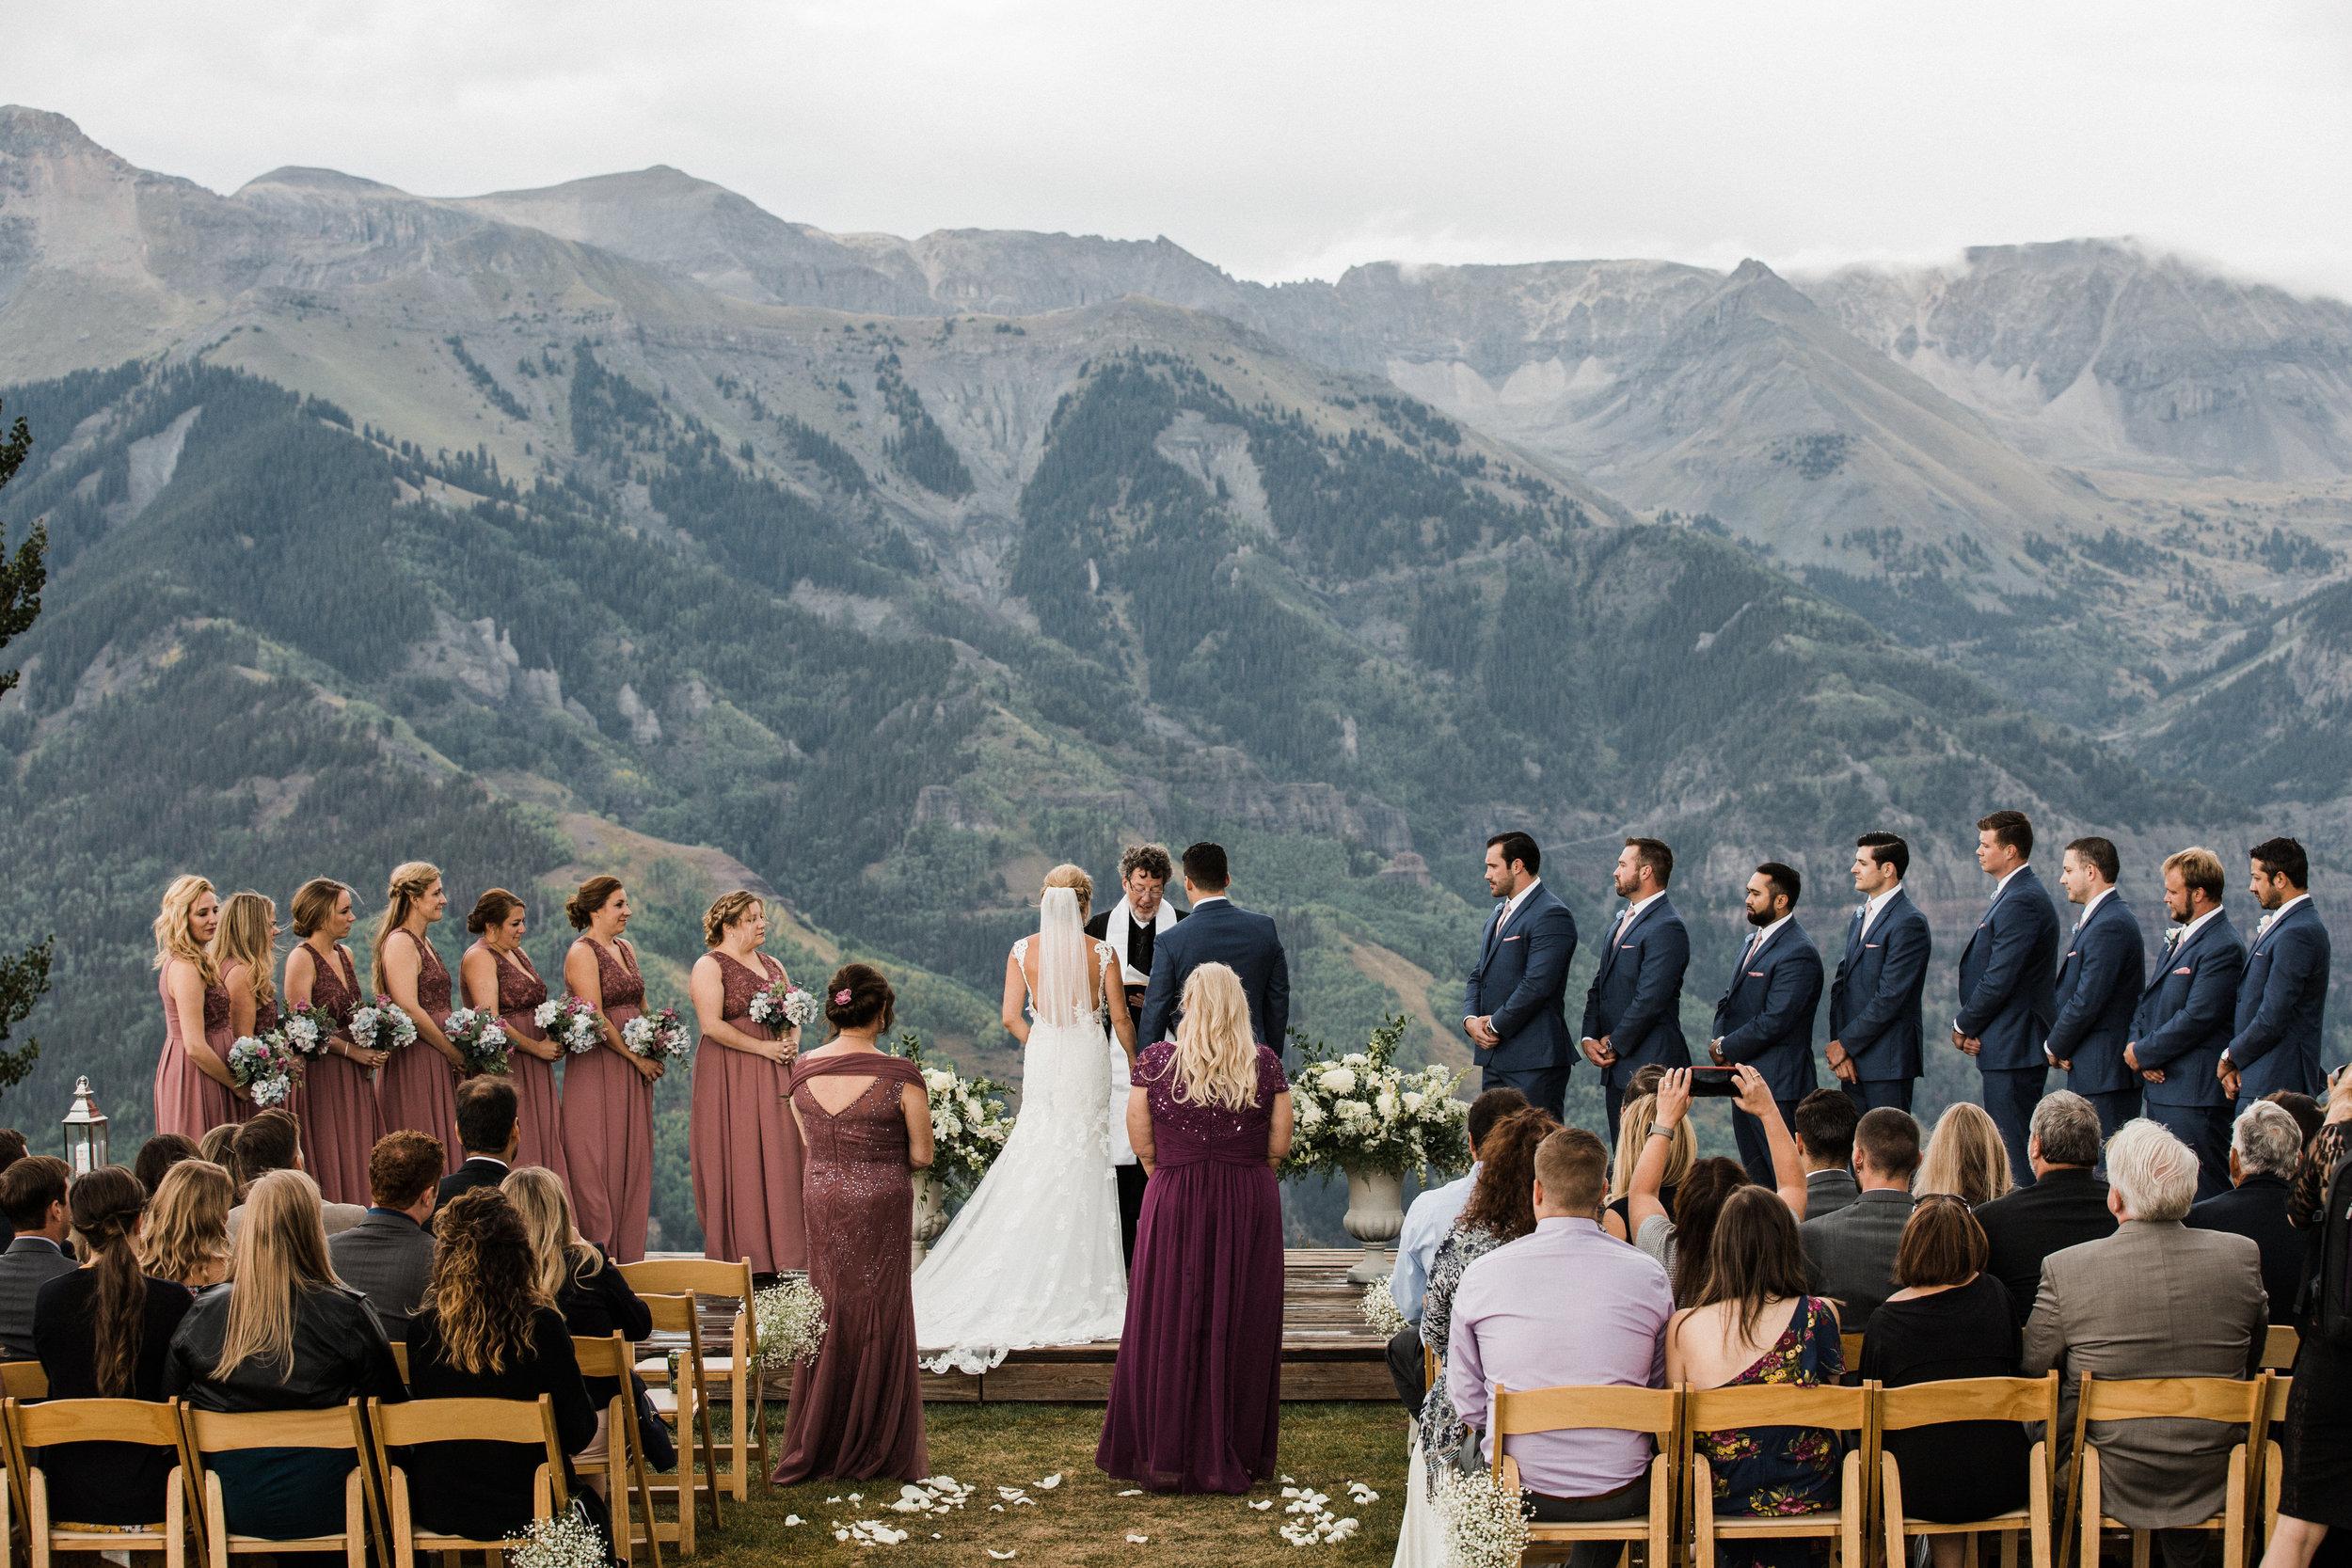 leahandashton-telluride-wedding-photography-0053.jpg